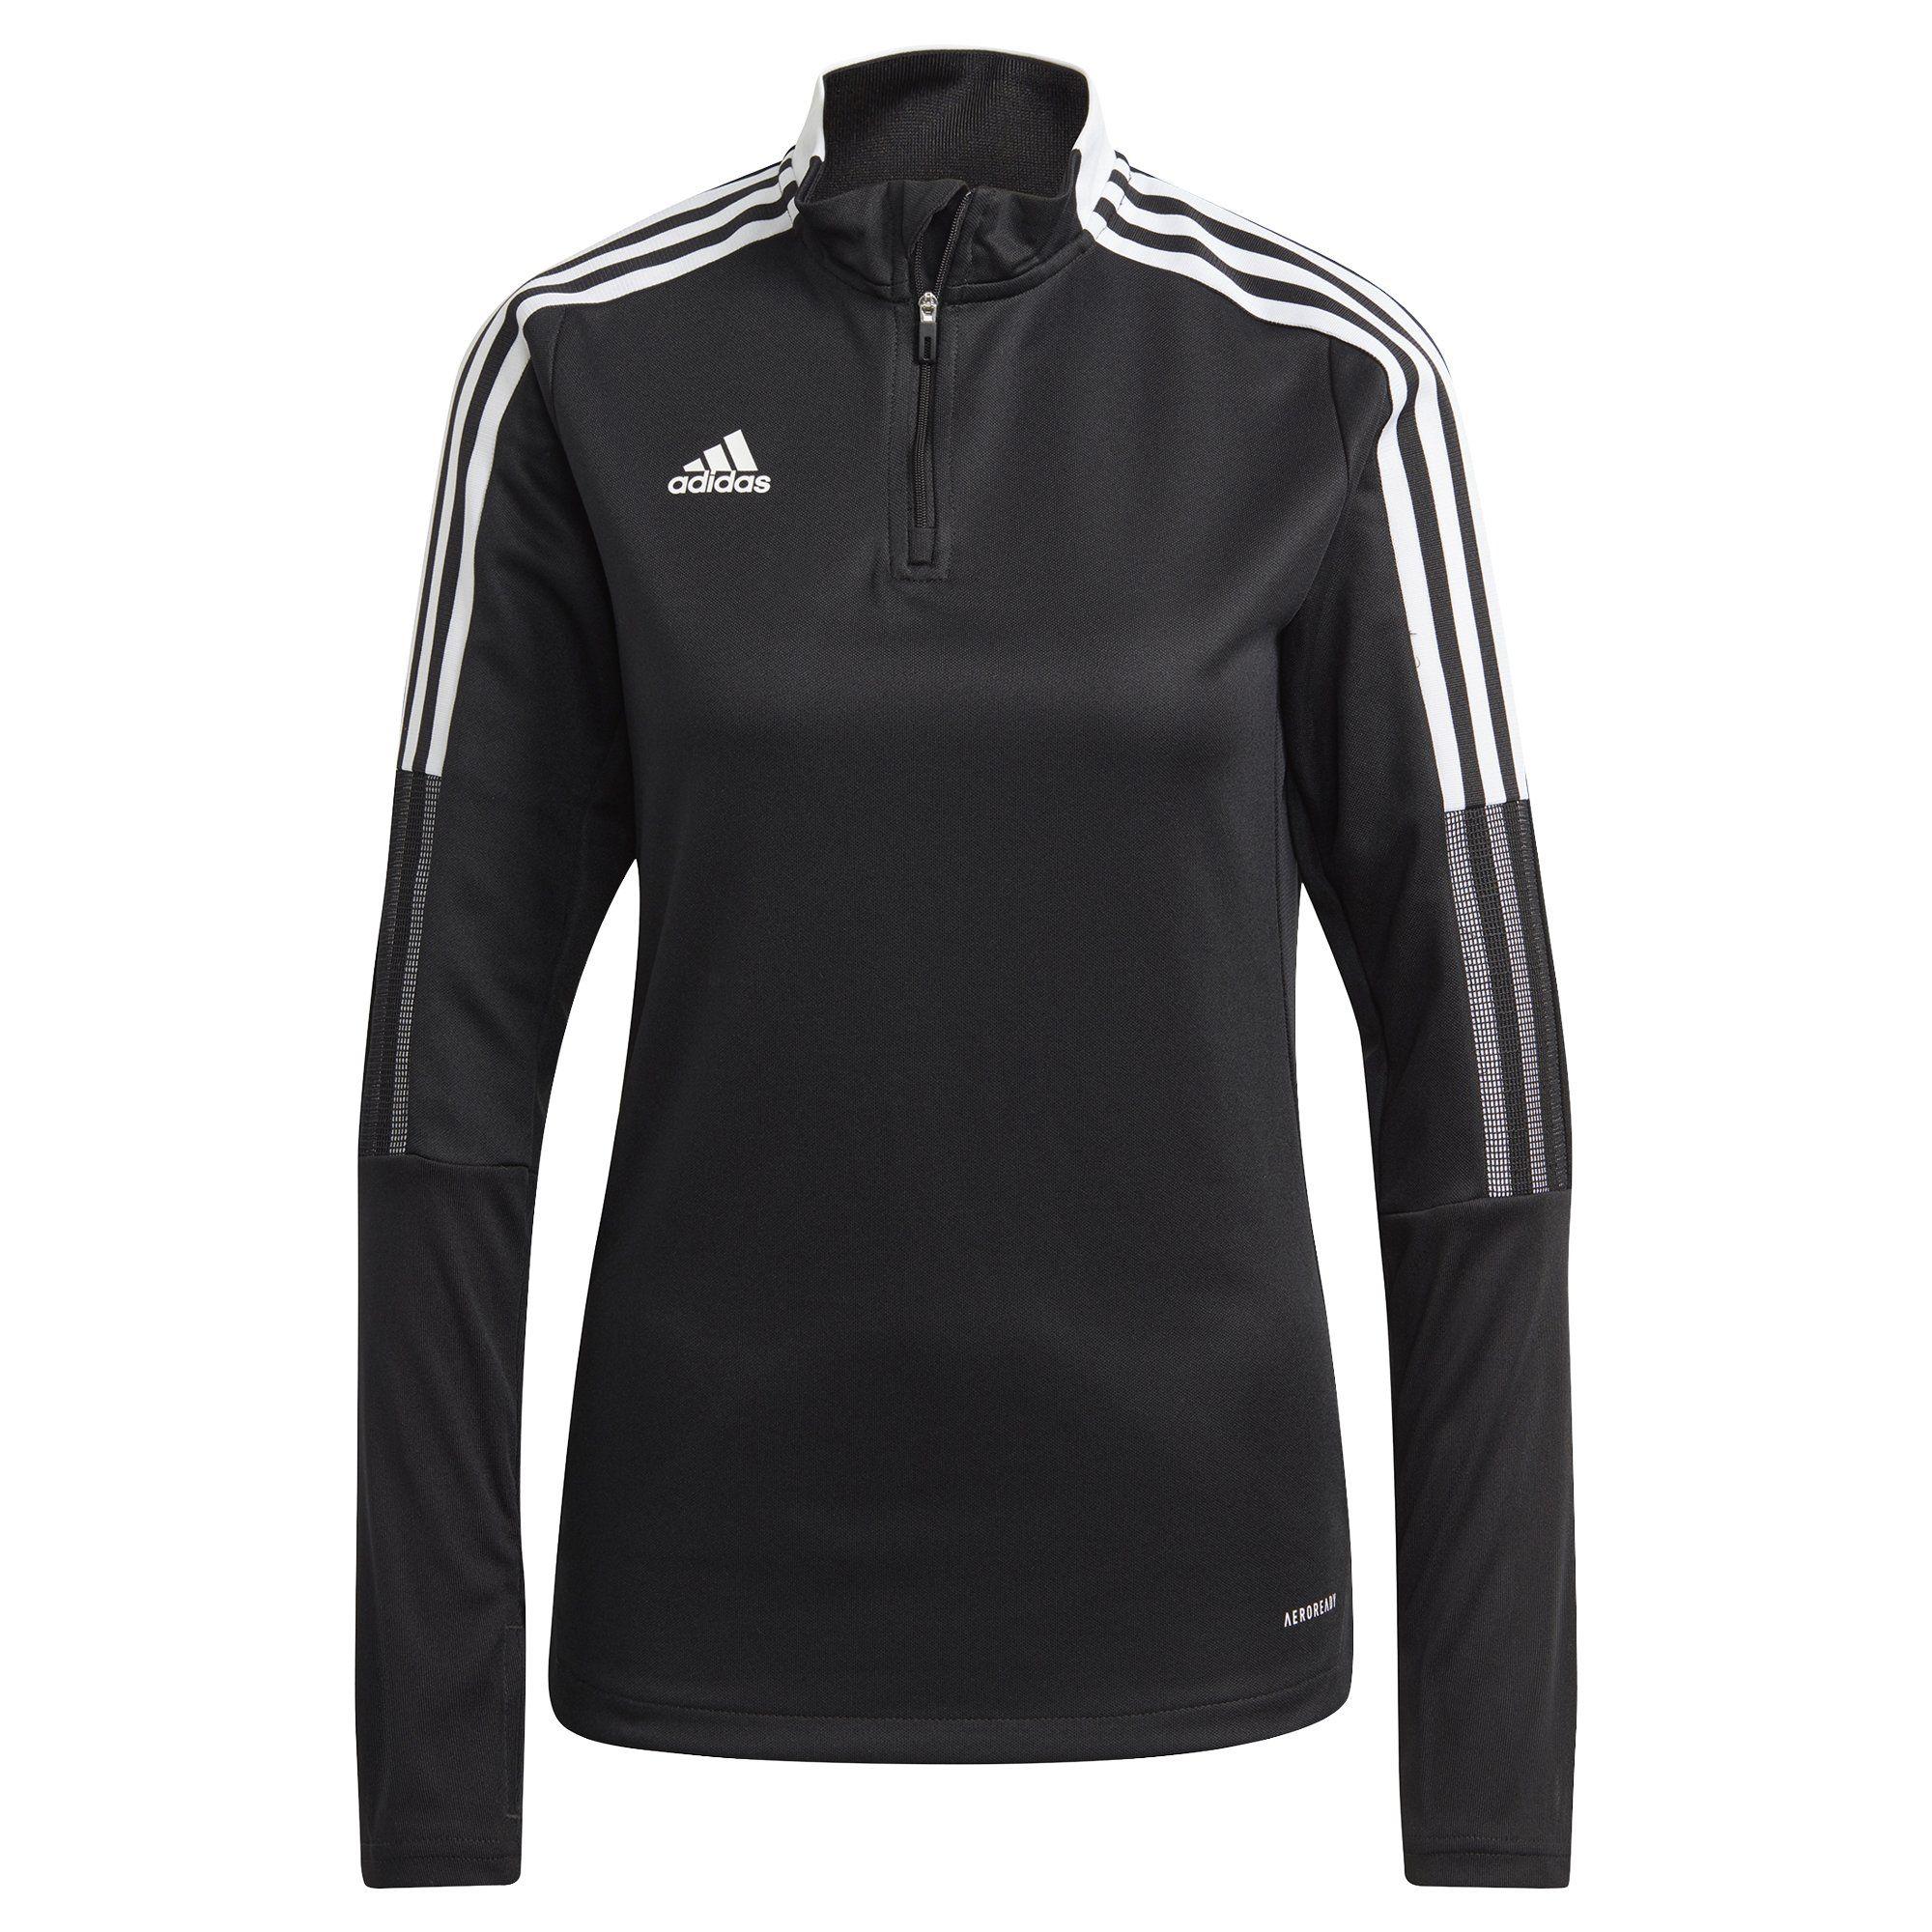 adidas Tiro 21 Trainingstrui Vrouwen Zwart Wit